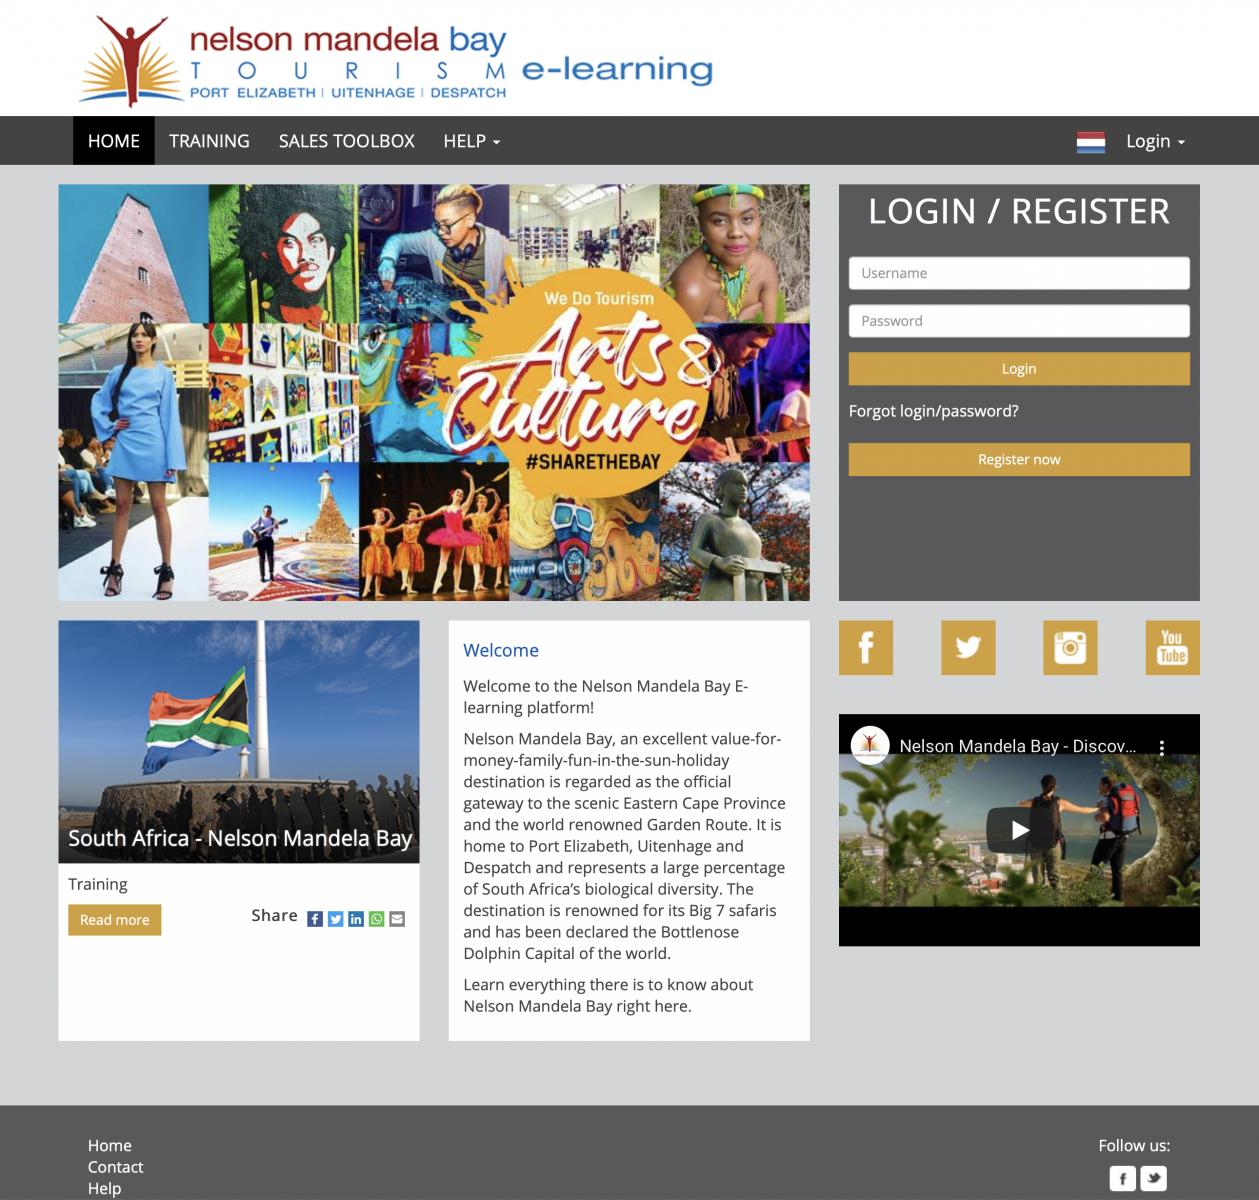 Nelson Mandela Bay E-learning platform Port Elizabeth destination training